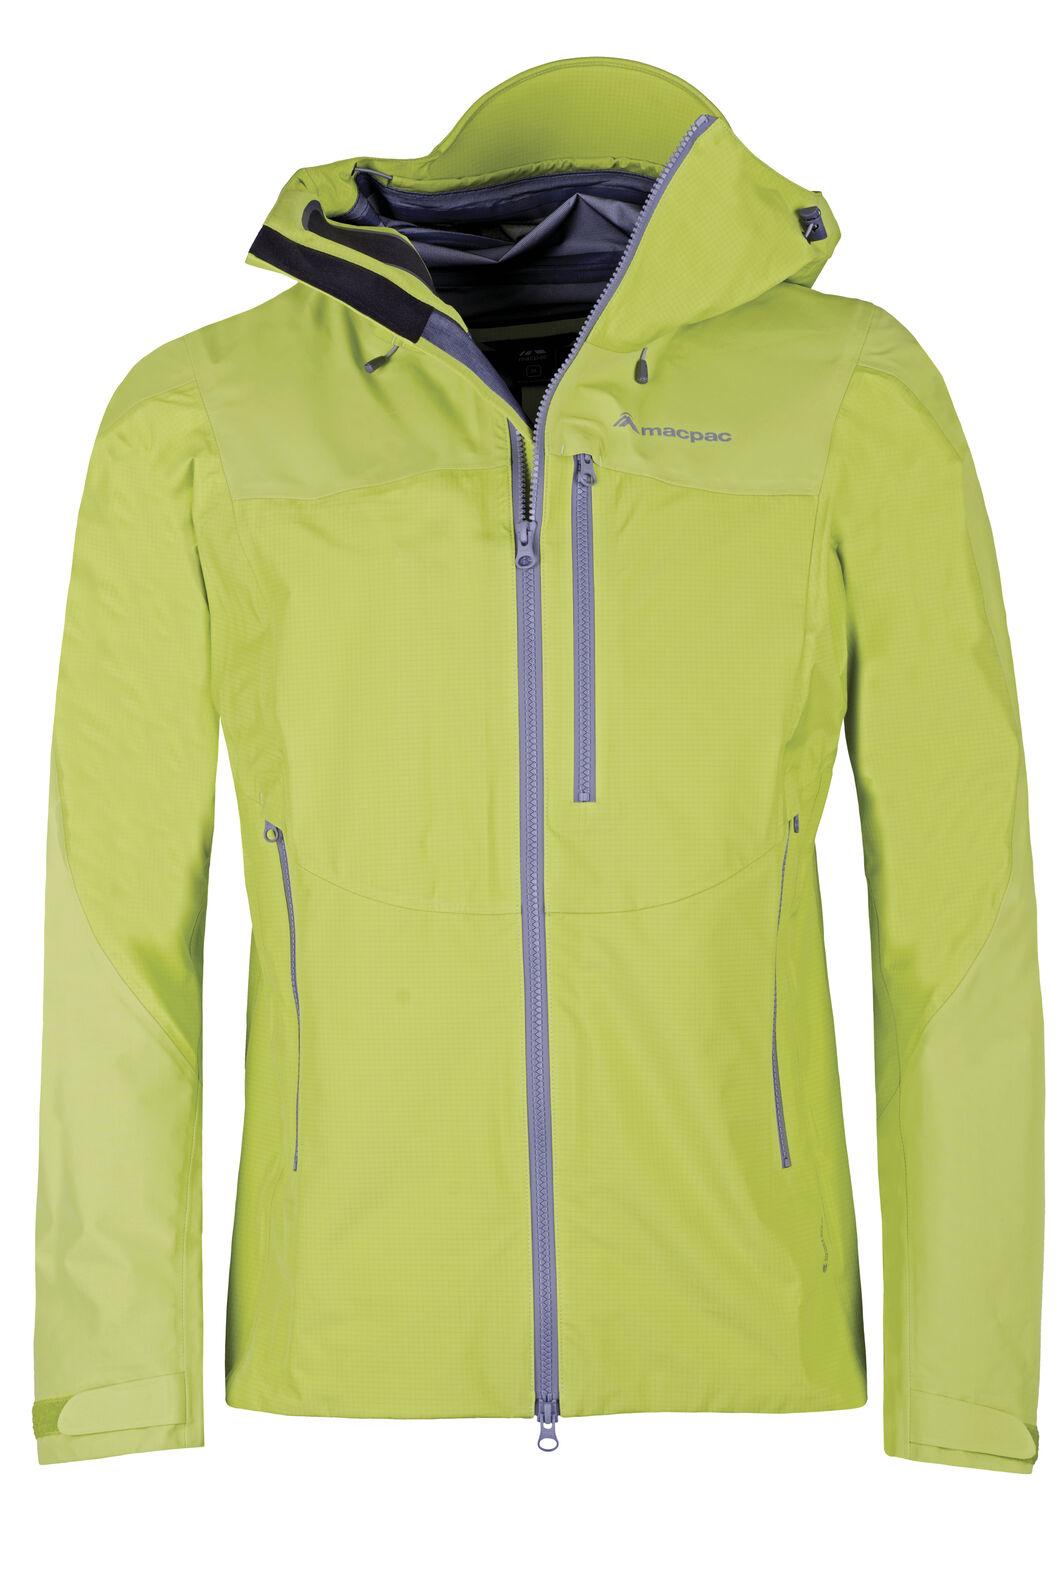 Macpac Lightweight Prophet Pertex® Rain Jacket - Men's, Apple, hi-res